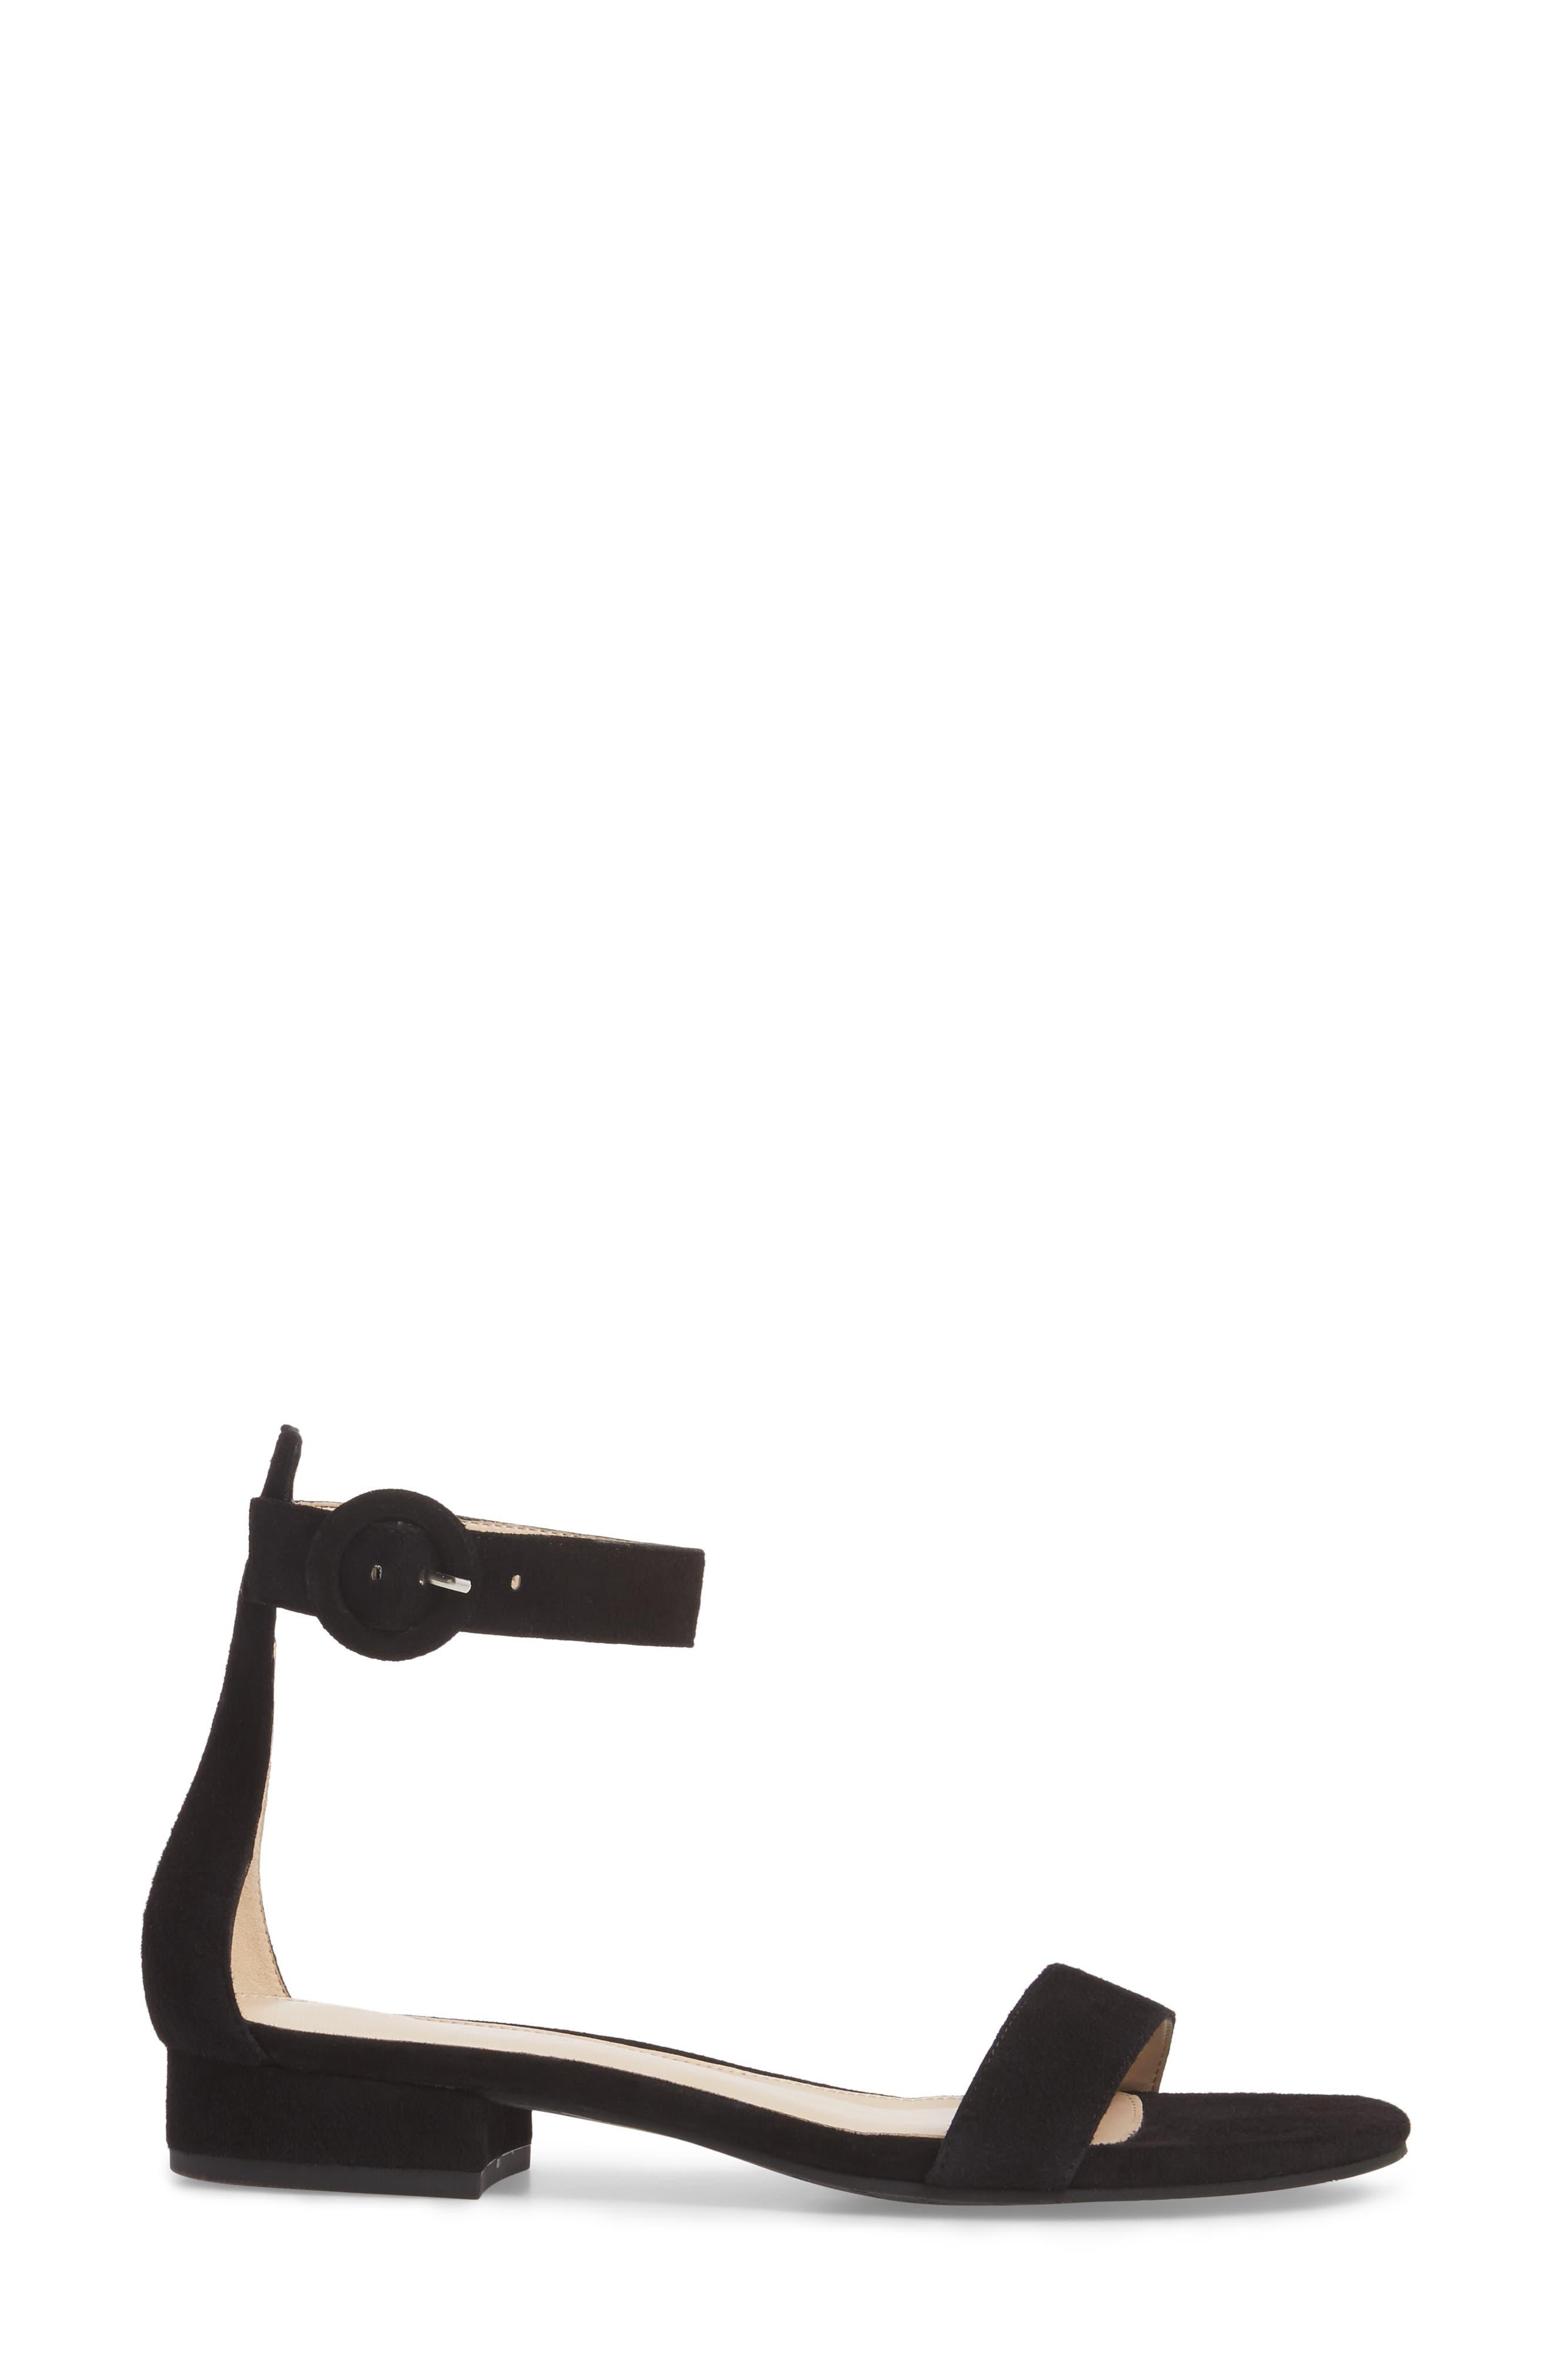 PELLE MODA,                             Newport Sandal,                             Alternate thumbnail 3, color,                             BLACK SUEDE